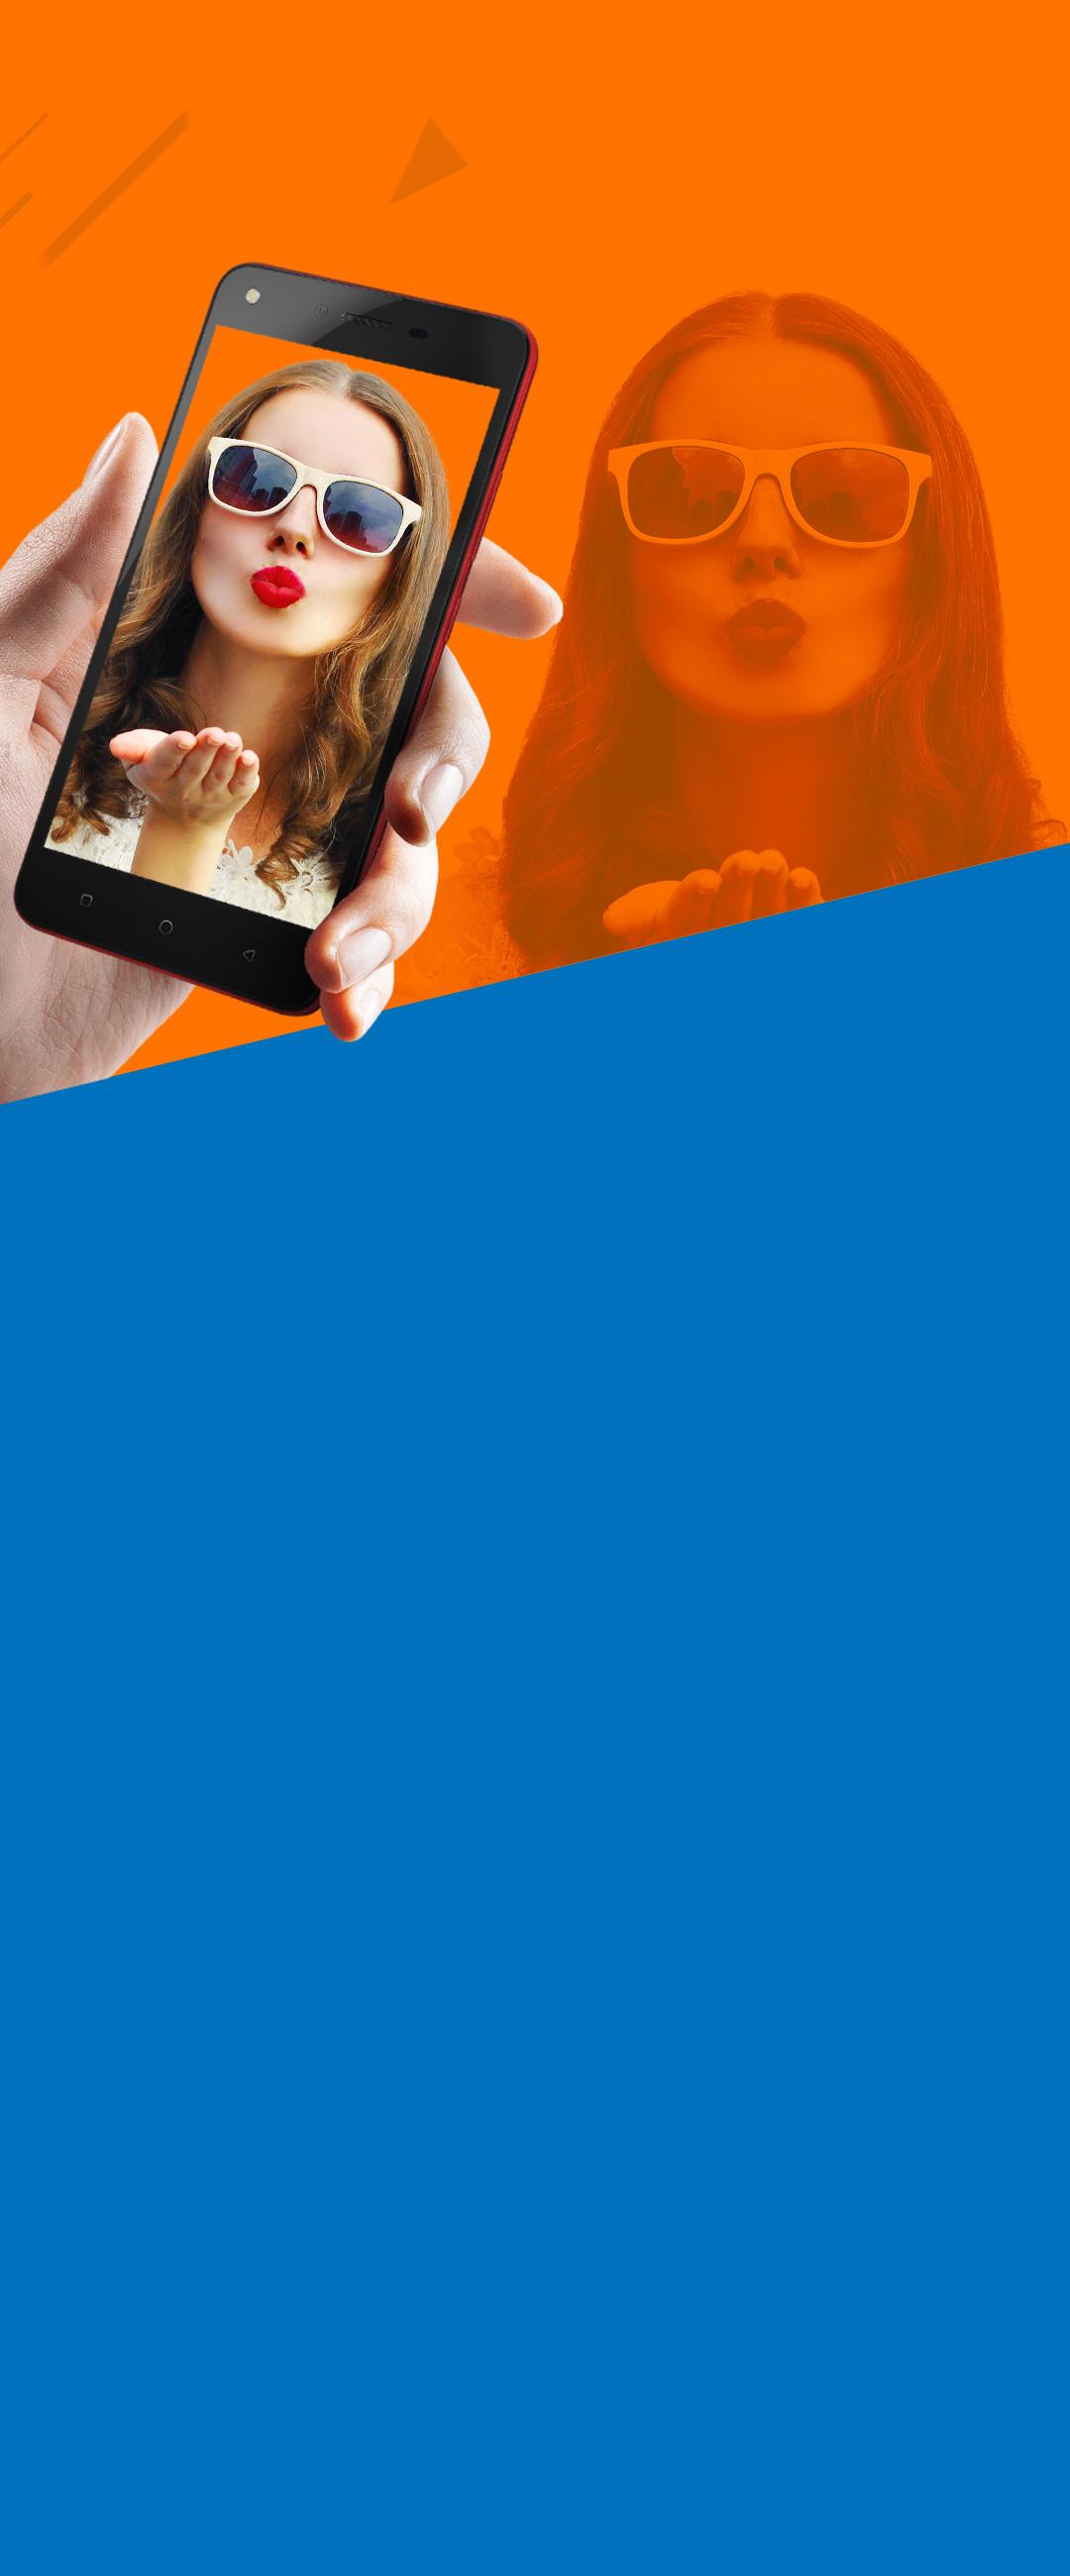 Tecno Spark K7 - 2GB Ram - 16GB Rom - Fingerprint - Blue